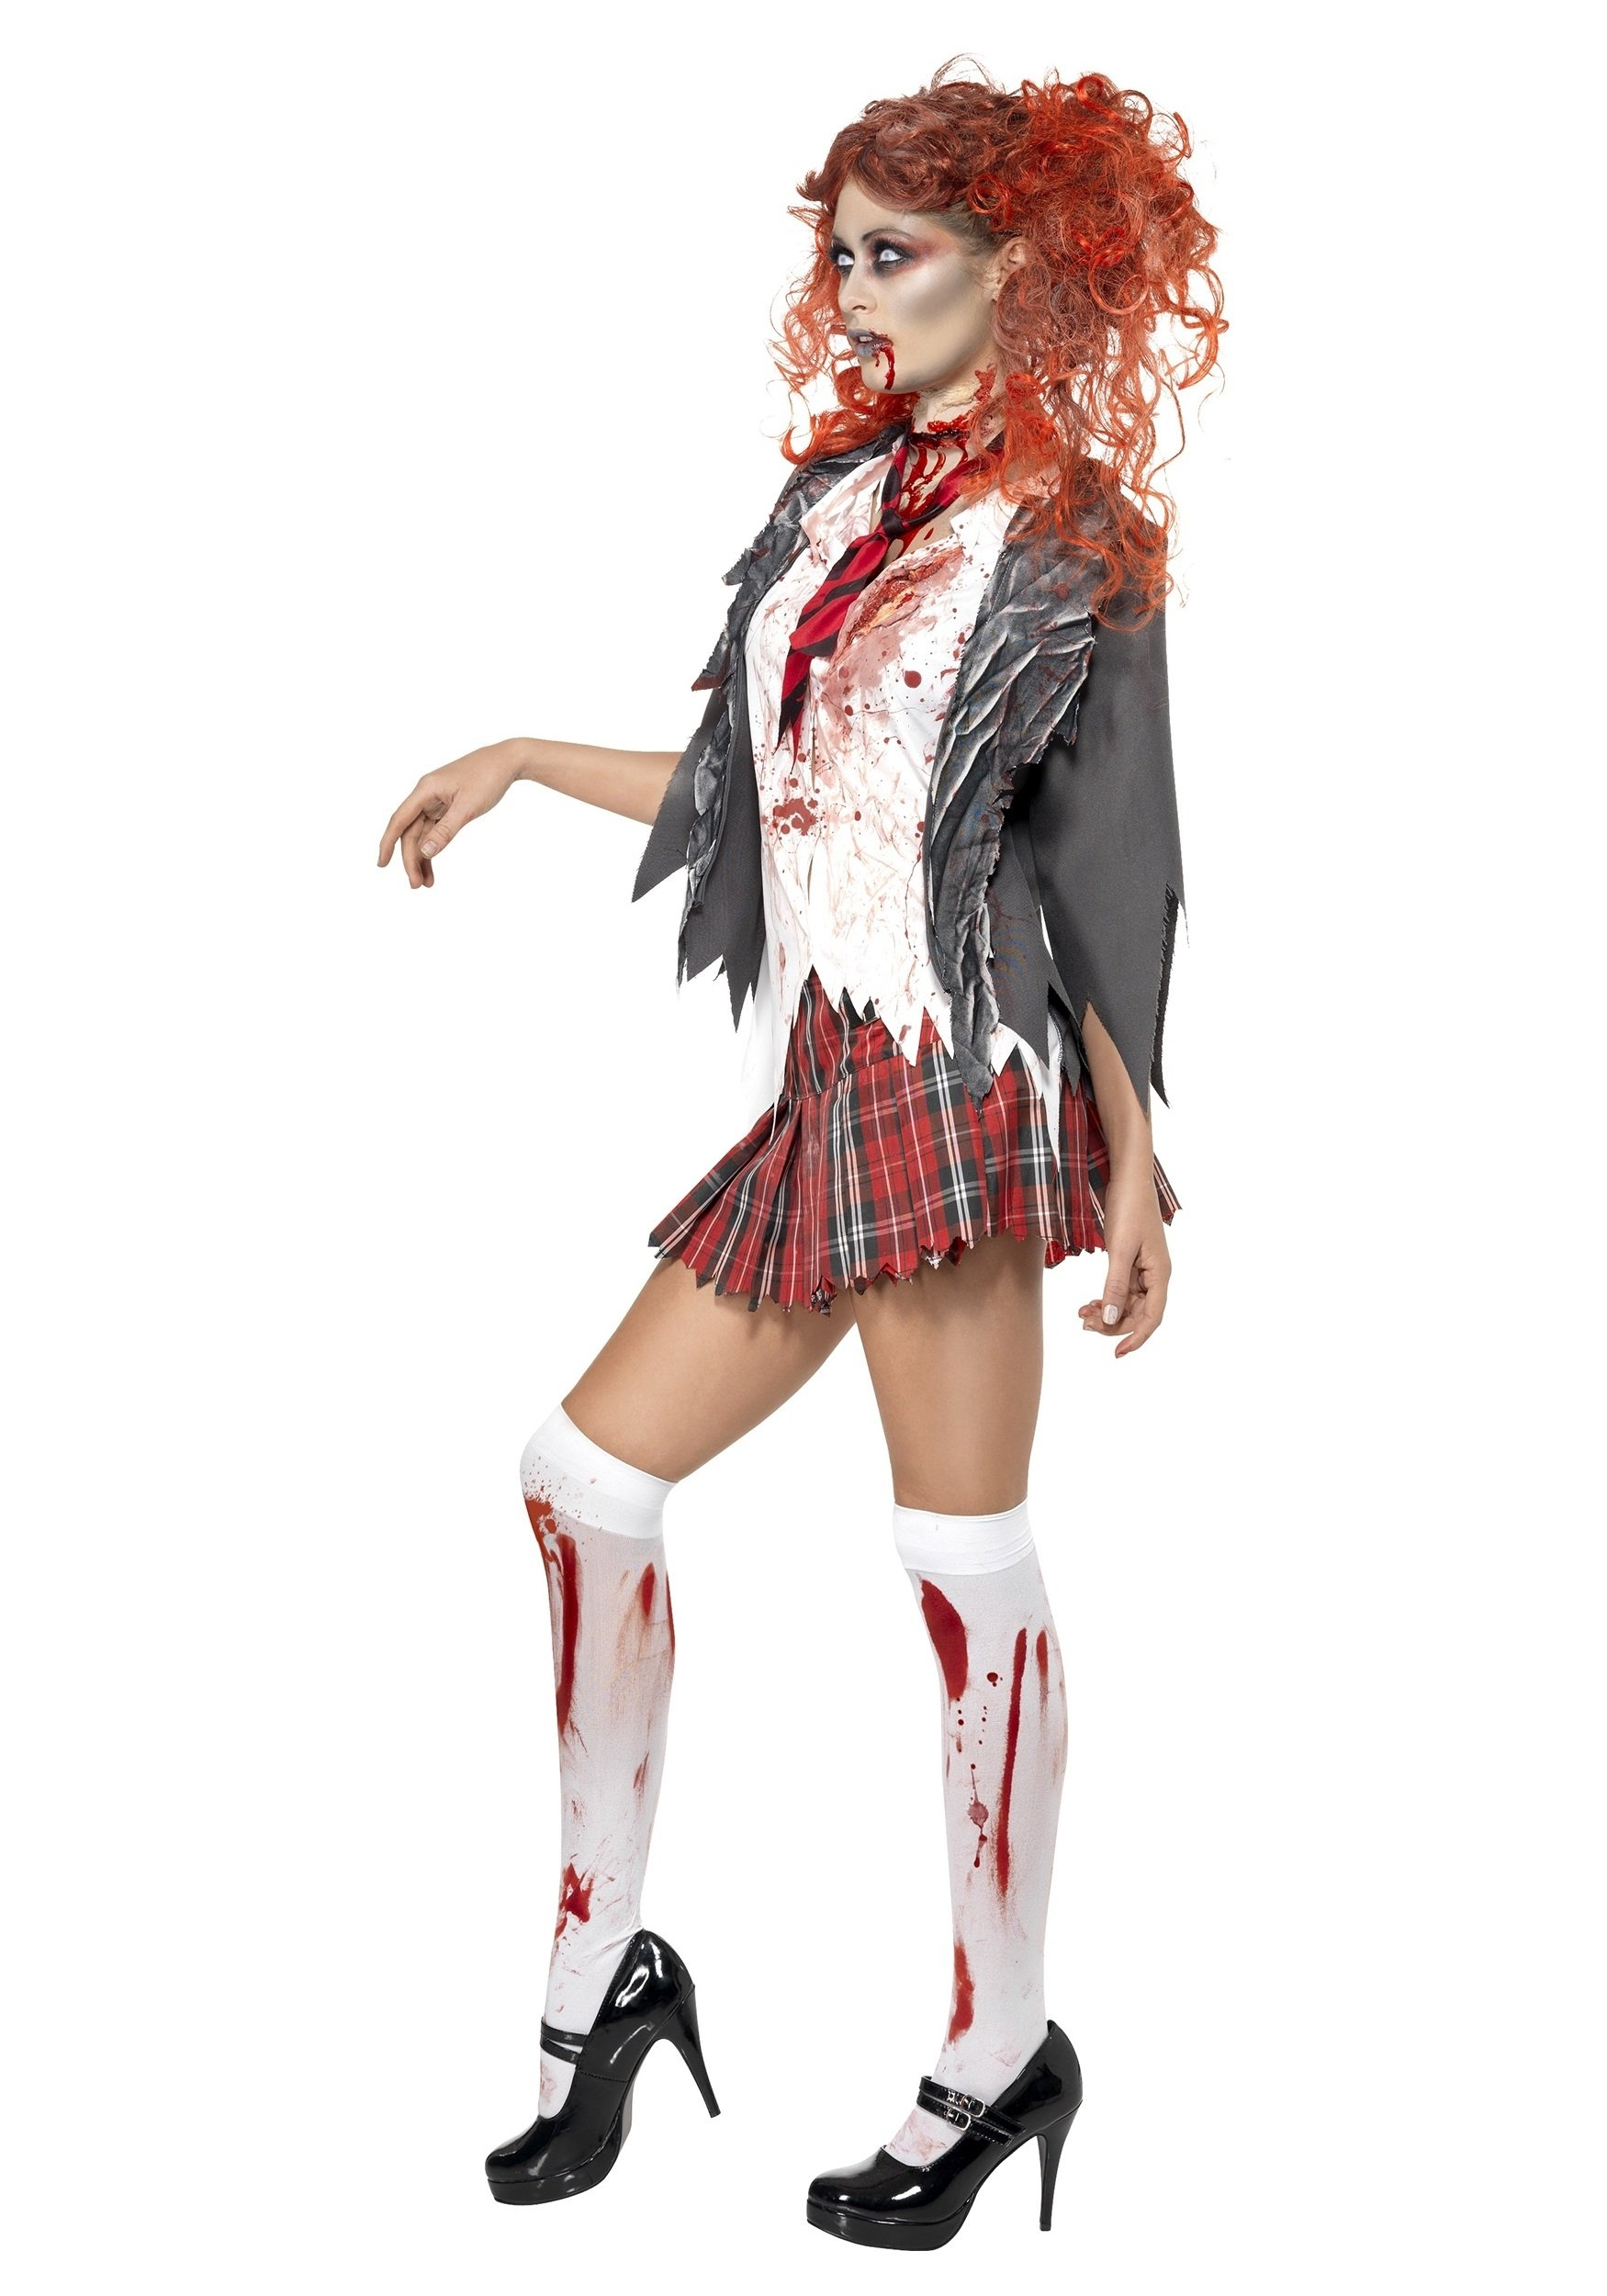 10 Ideal High School Halloween Costume Ideas school girl zombie costume 2021